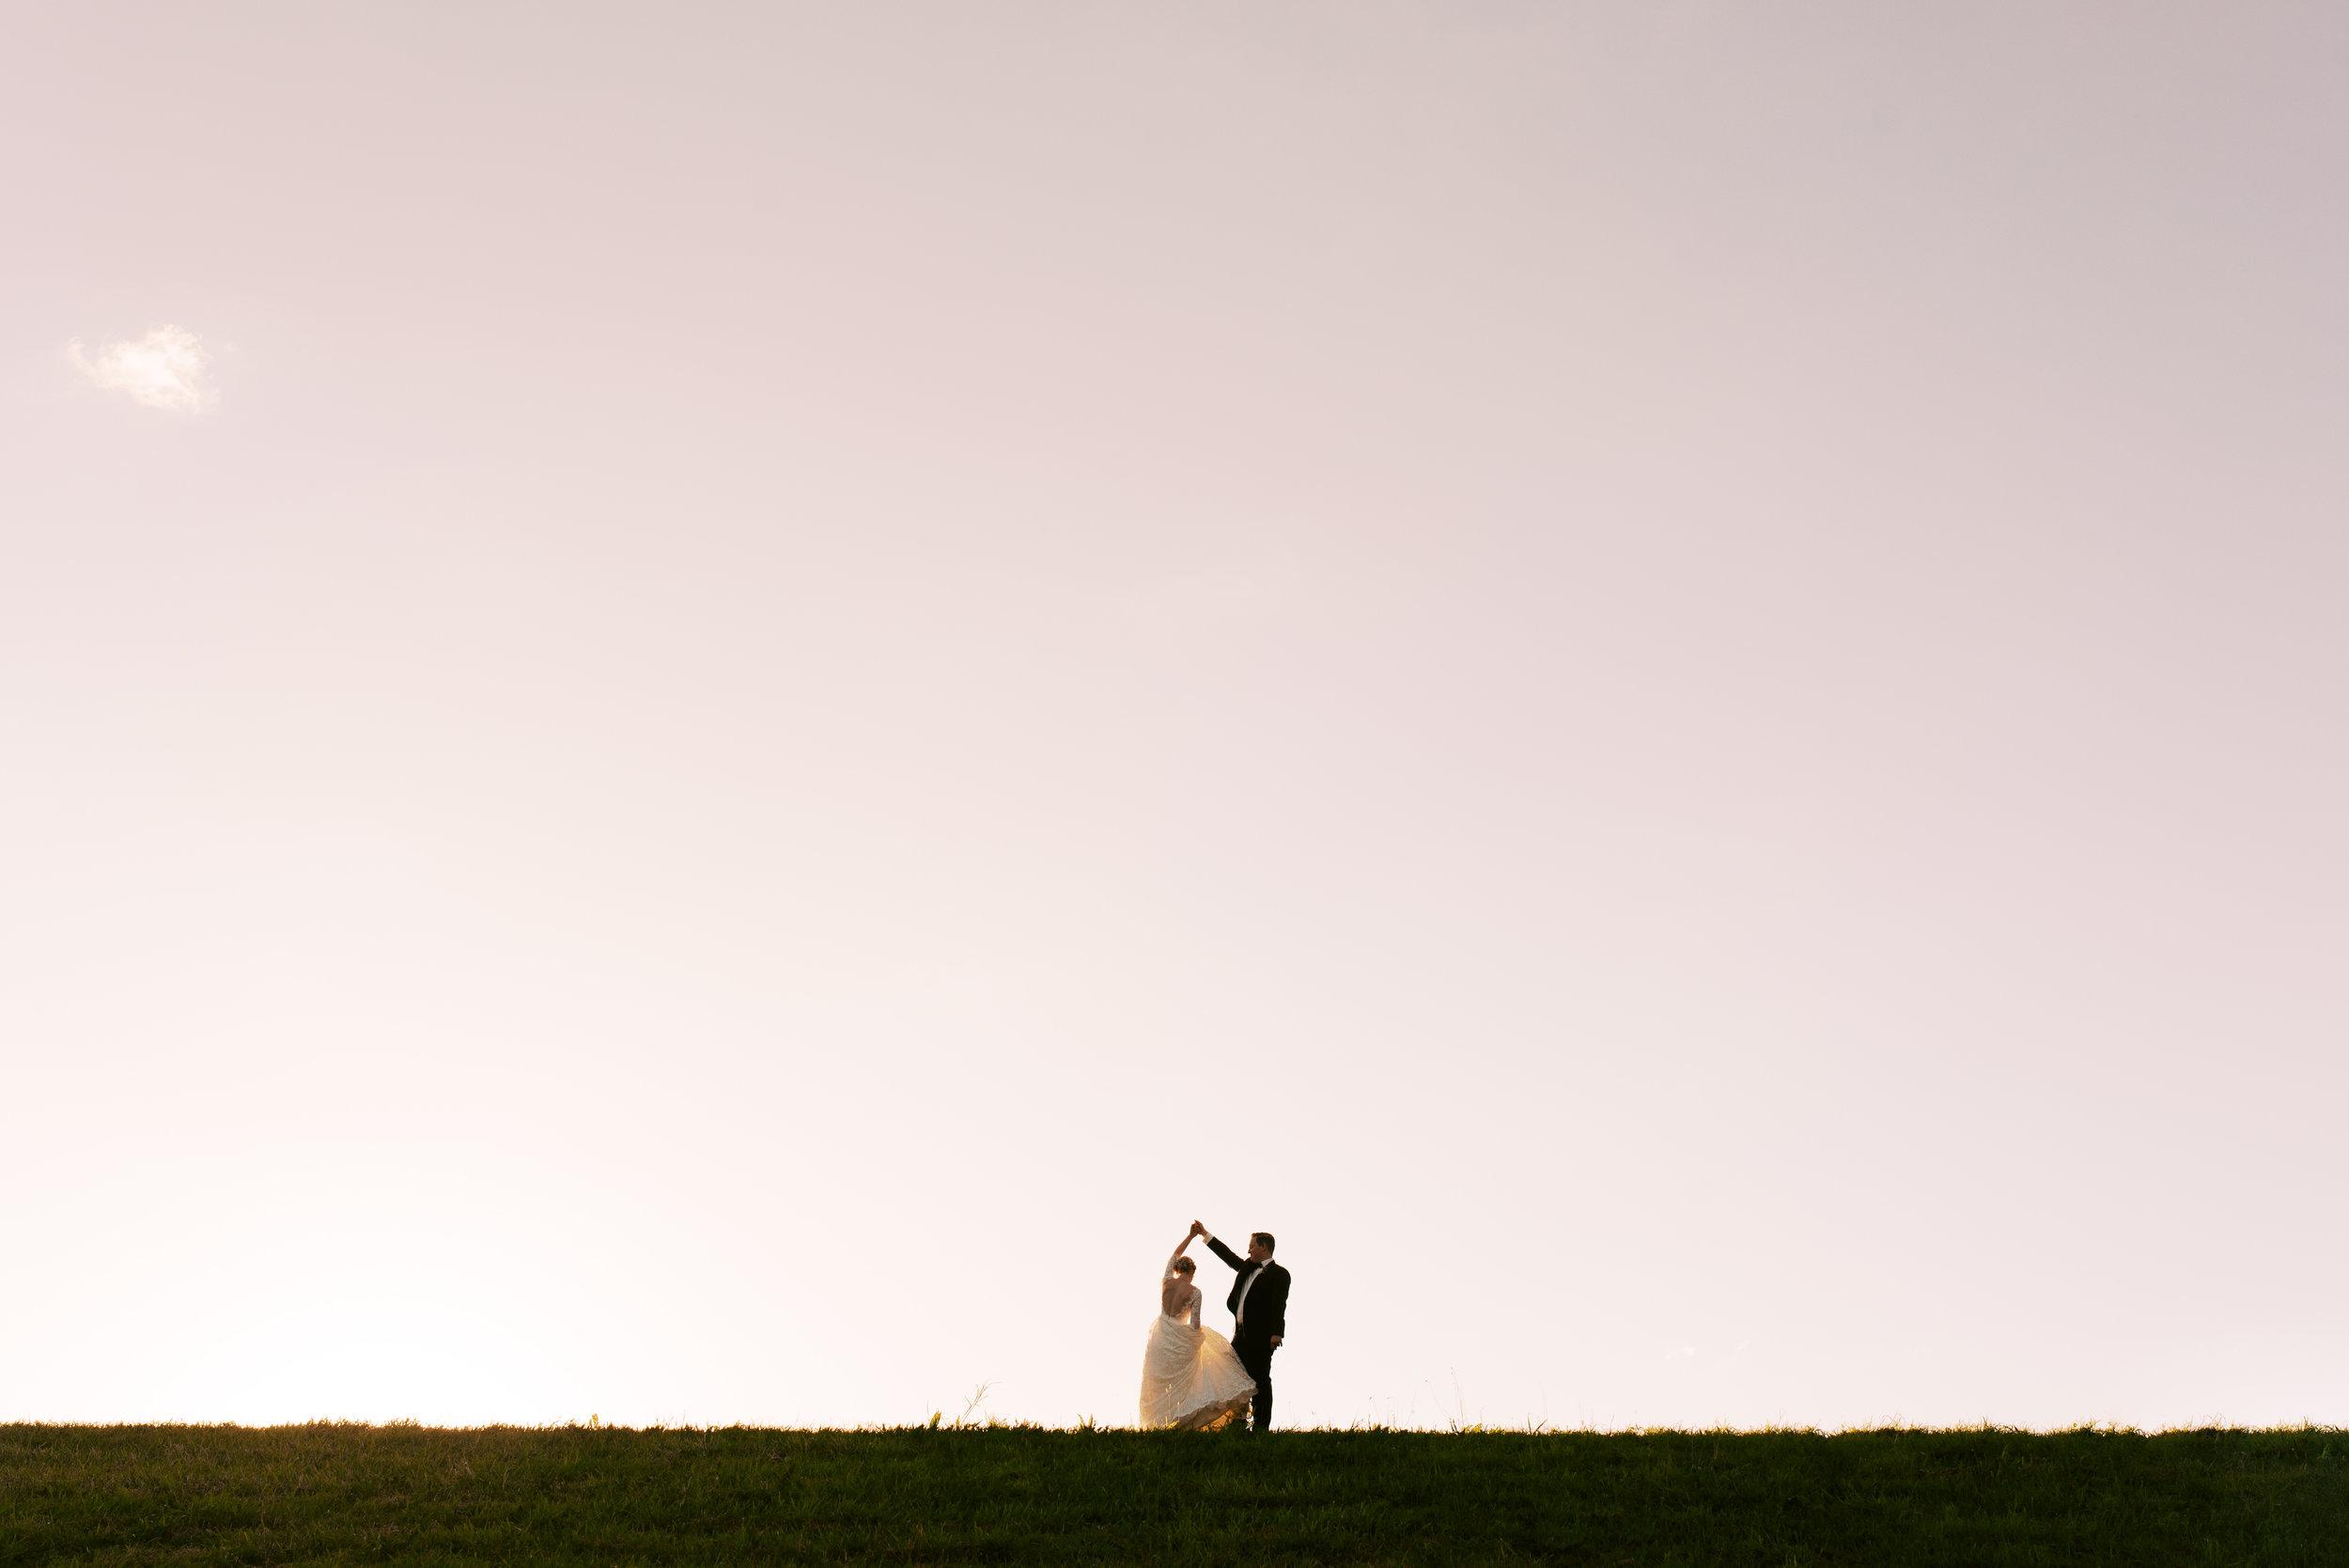 brisbane-gold-coast-sunshine-coast-tweed-romantic-fine-art-wedding-photography-lauren-olivia-46.jpg